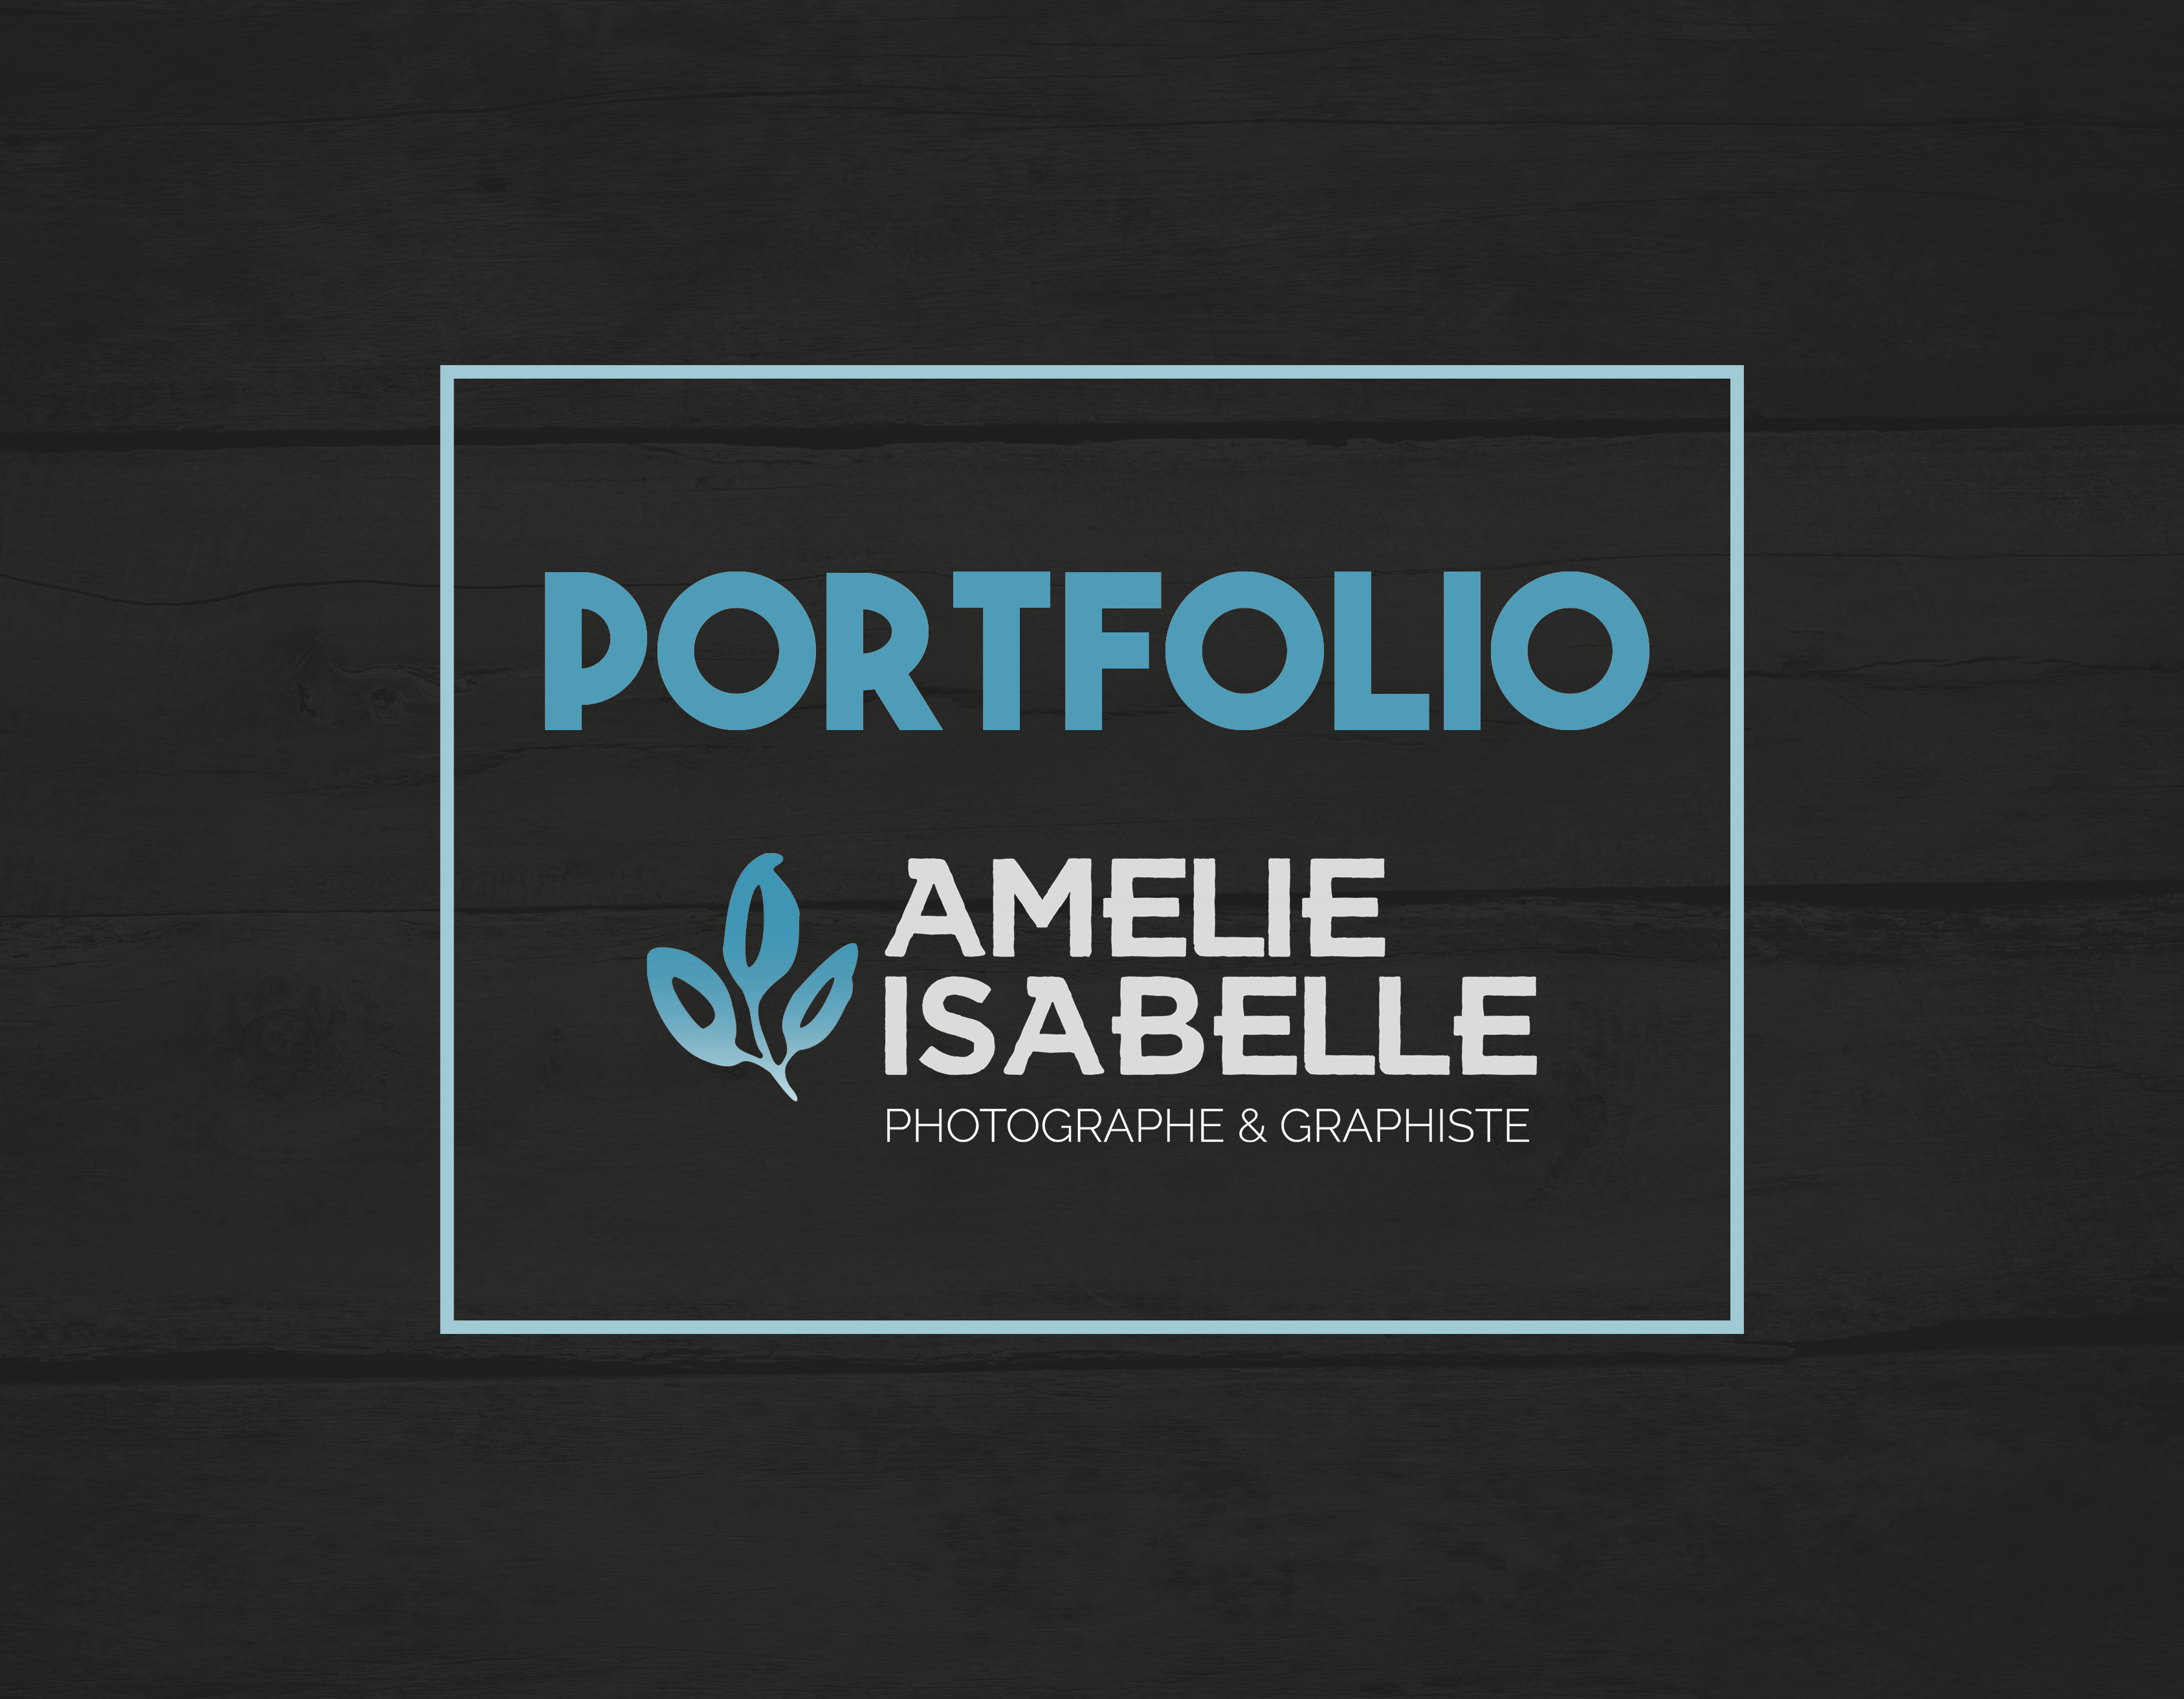 PORTFOLIO_ISABELLE_AMELIE